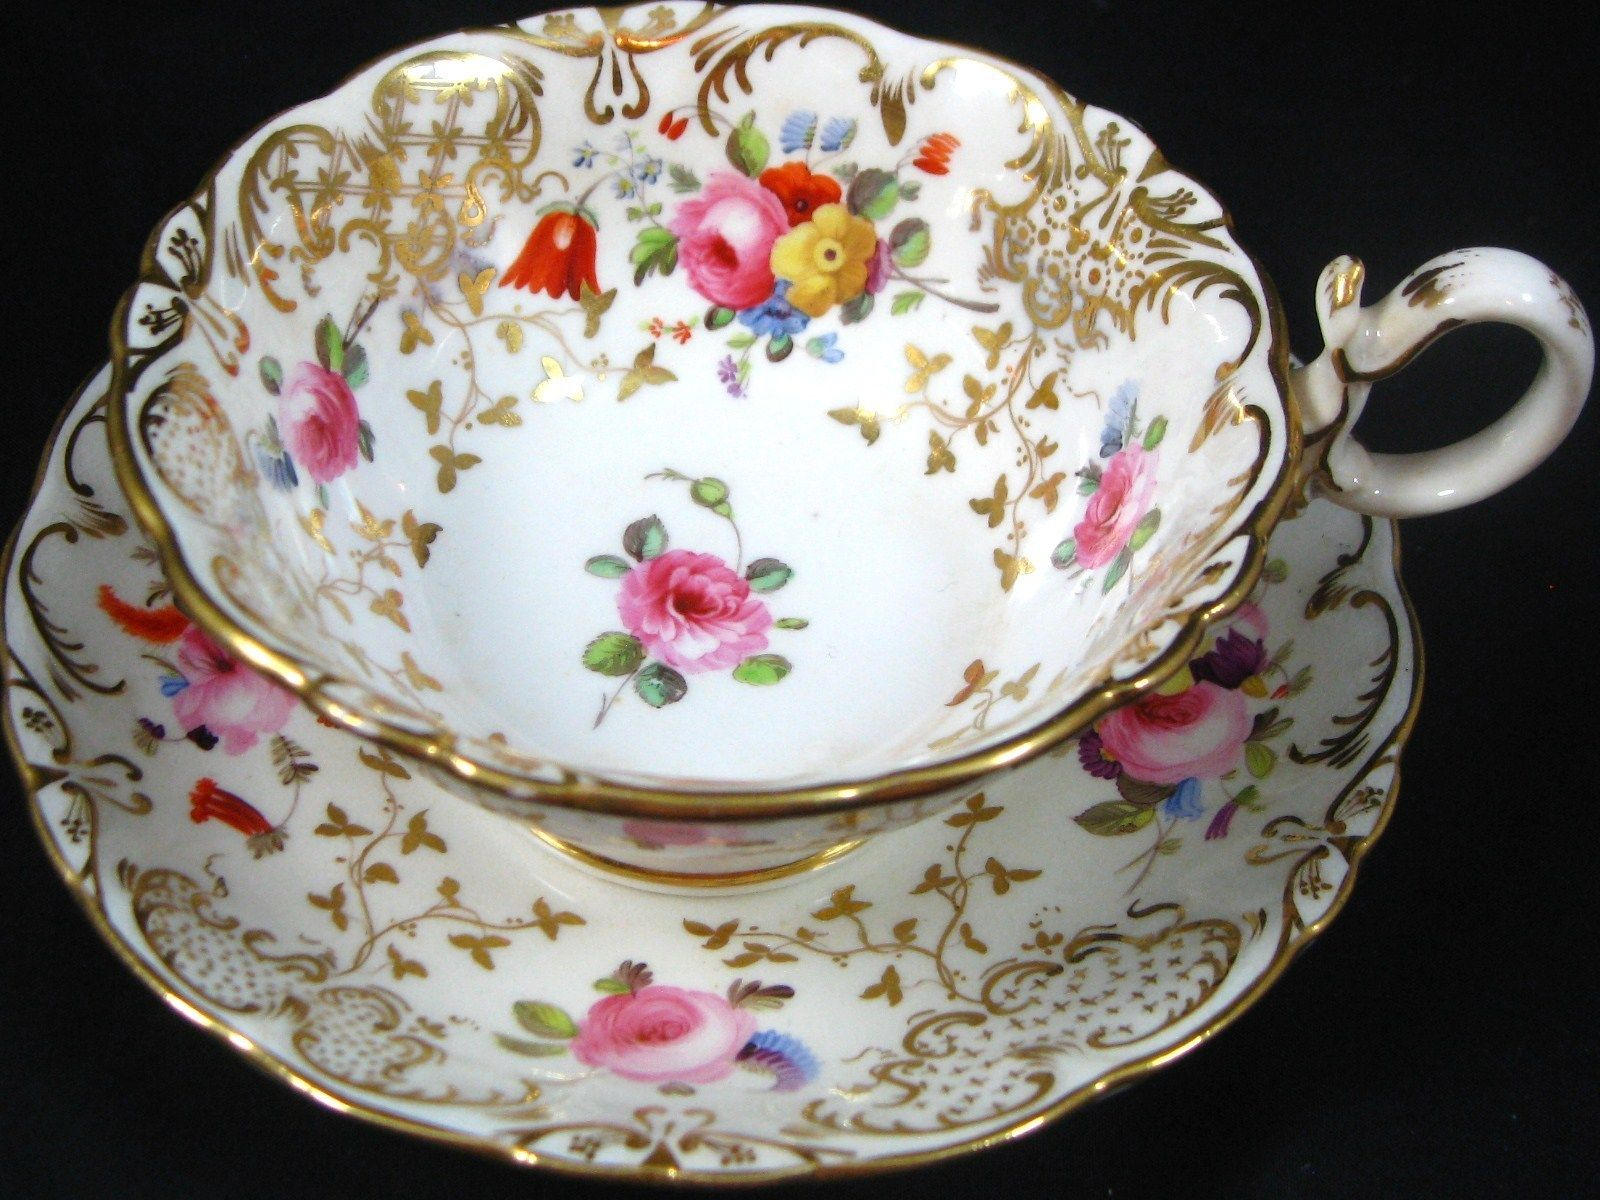 1830 coalport ornate hp floral gold antique tea cup and saucer porzellan und keramik. Black Bedroom Furniture Sets. Home Design Ideas